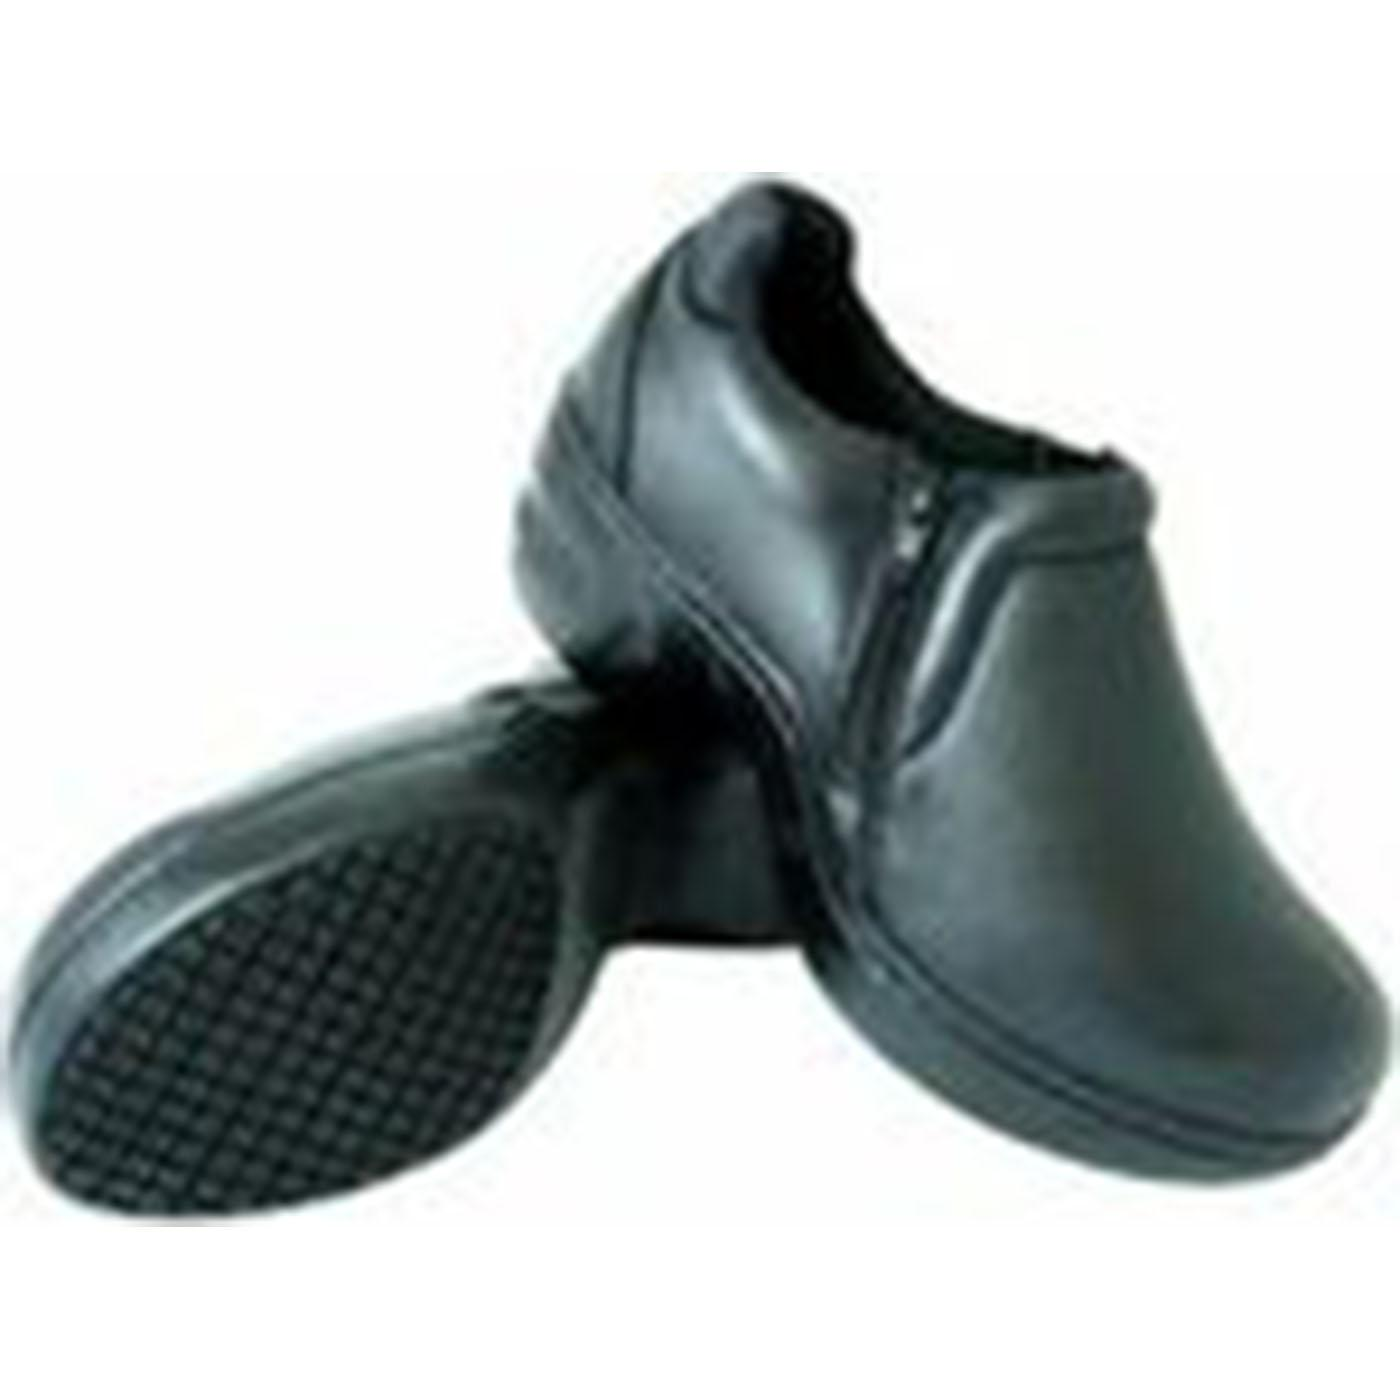 7d3a5d976eea Genuine Grip Women s Slip-Resistant Slip-On ShoeGenuine Grip Women s Slip-Resistant  Slip-On Shoe